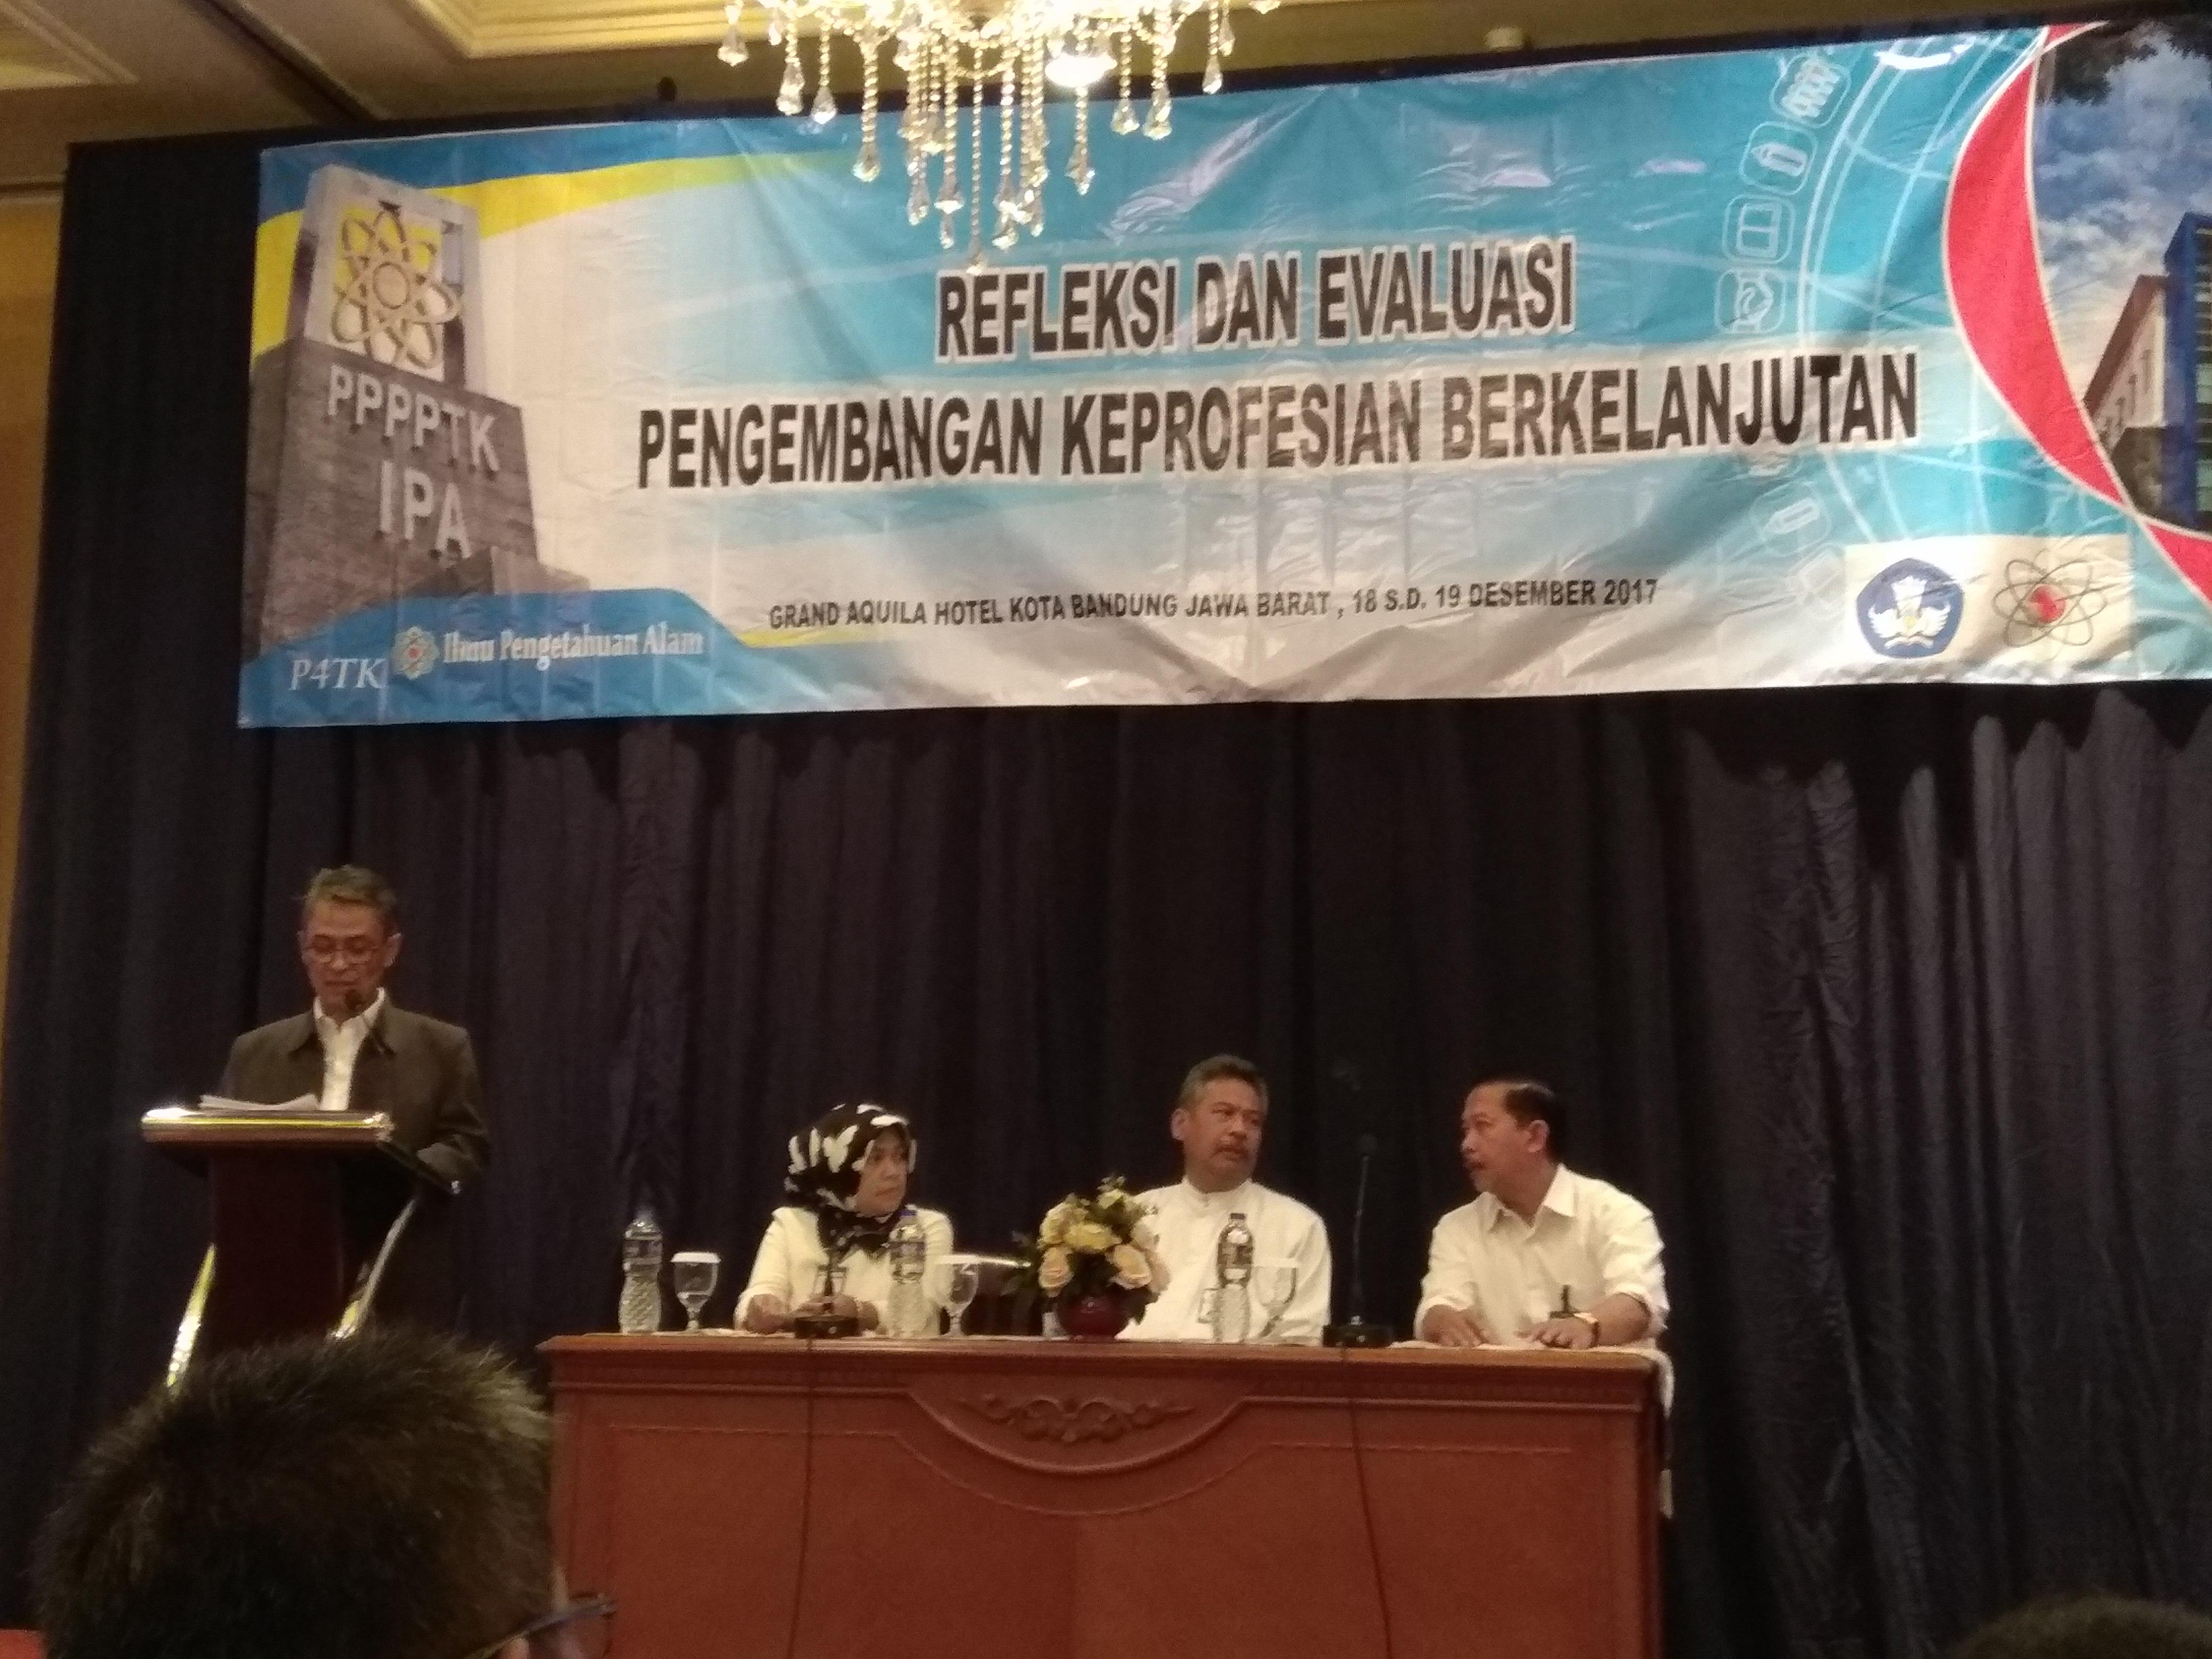 Refleksi dan Evaluasi PKB